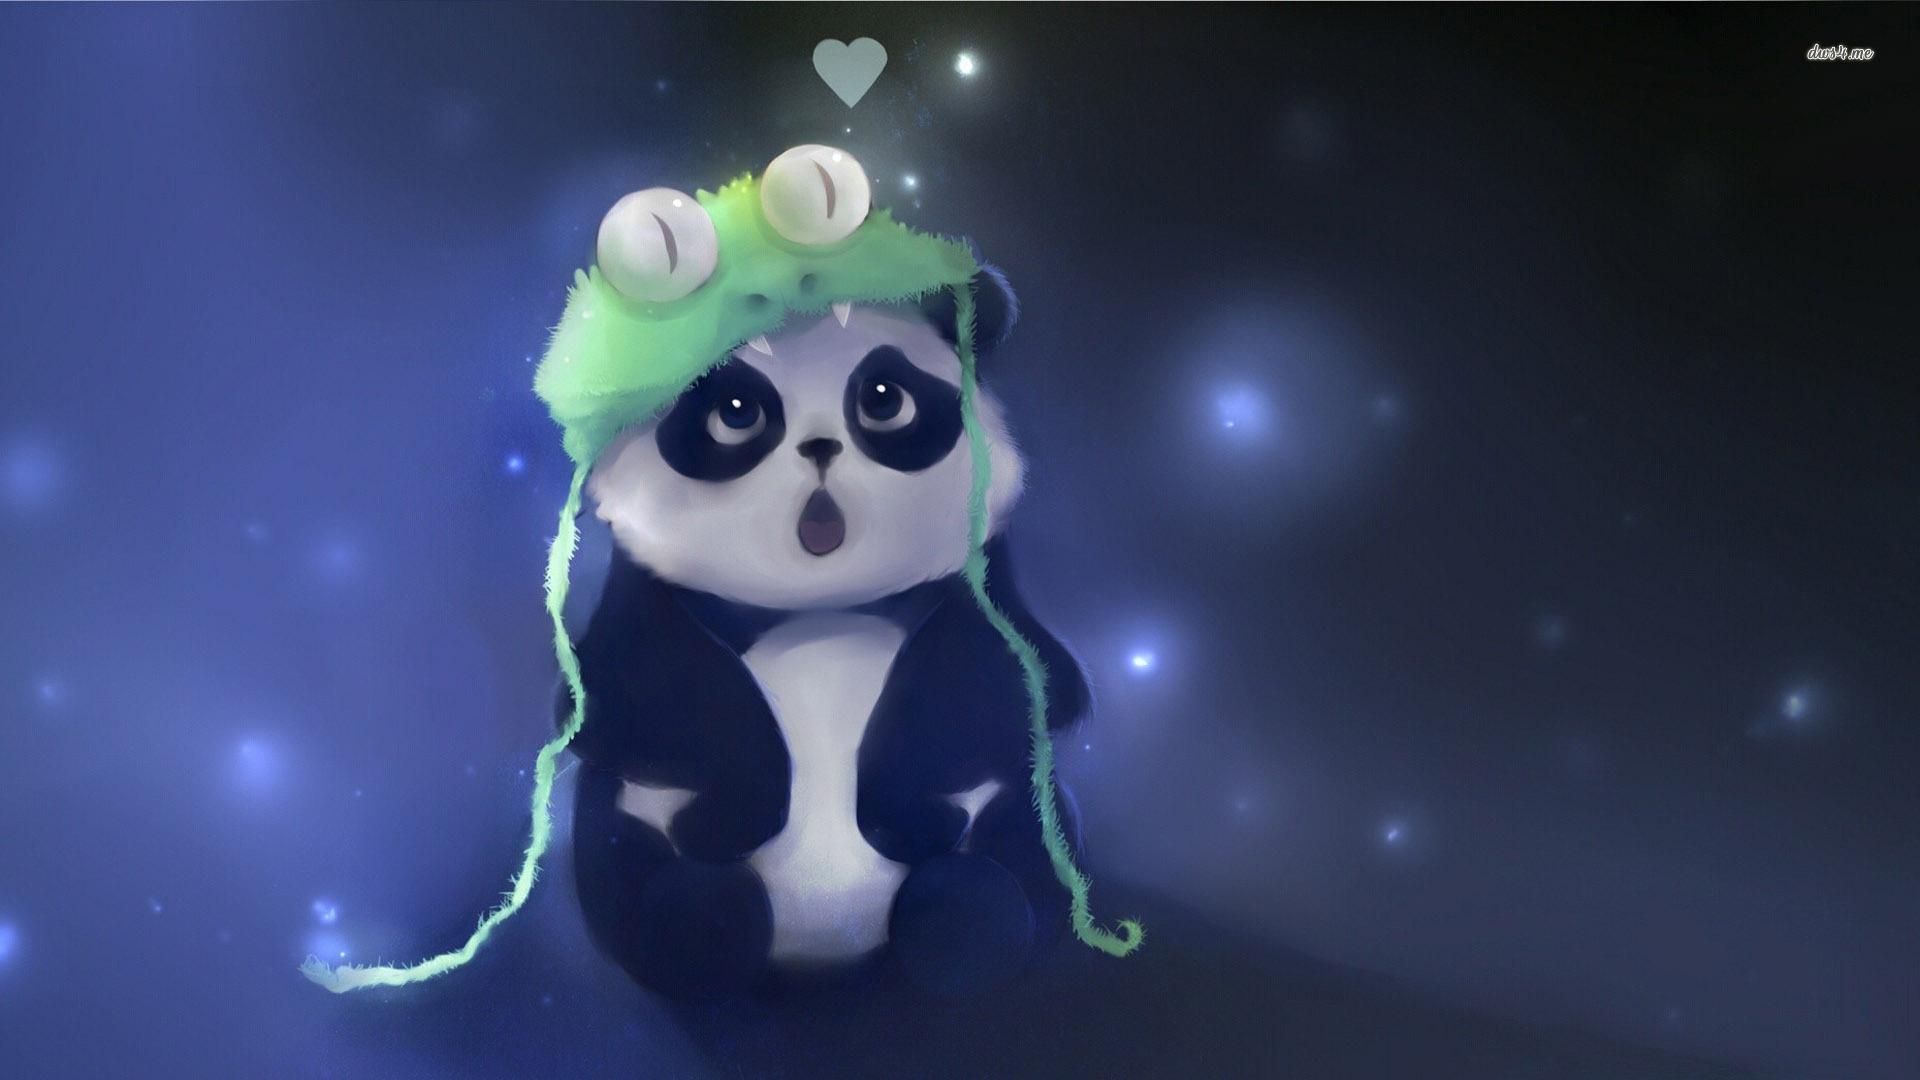 48+ Animated Panda Wallpaper on WallpaperSafari